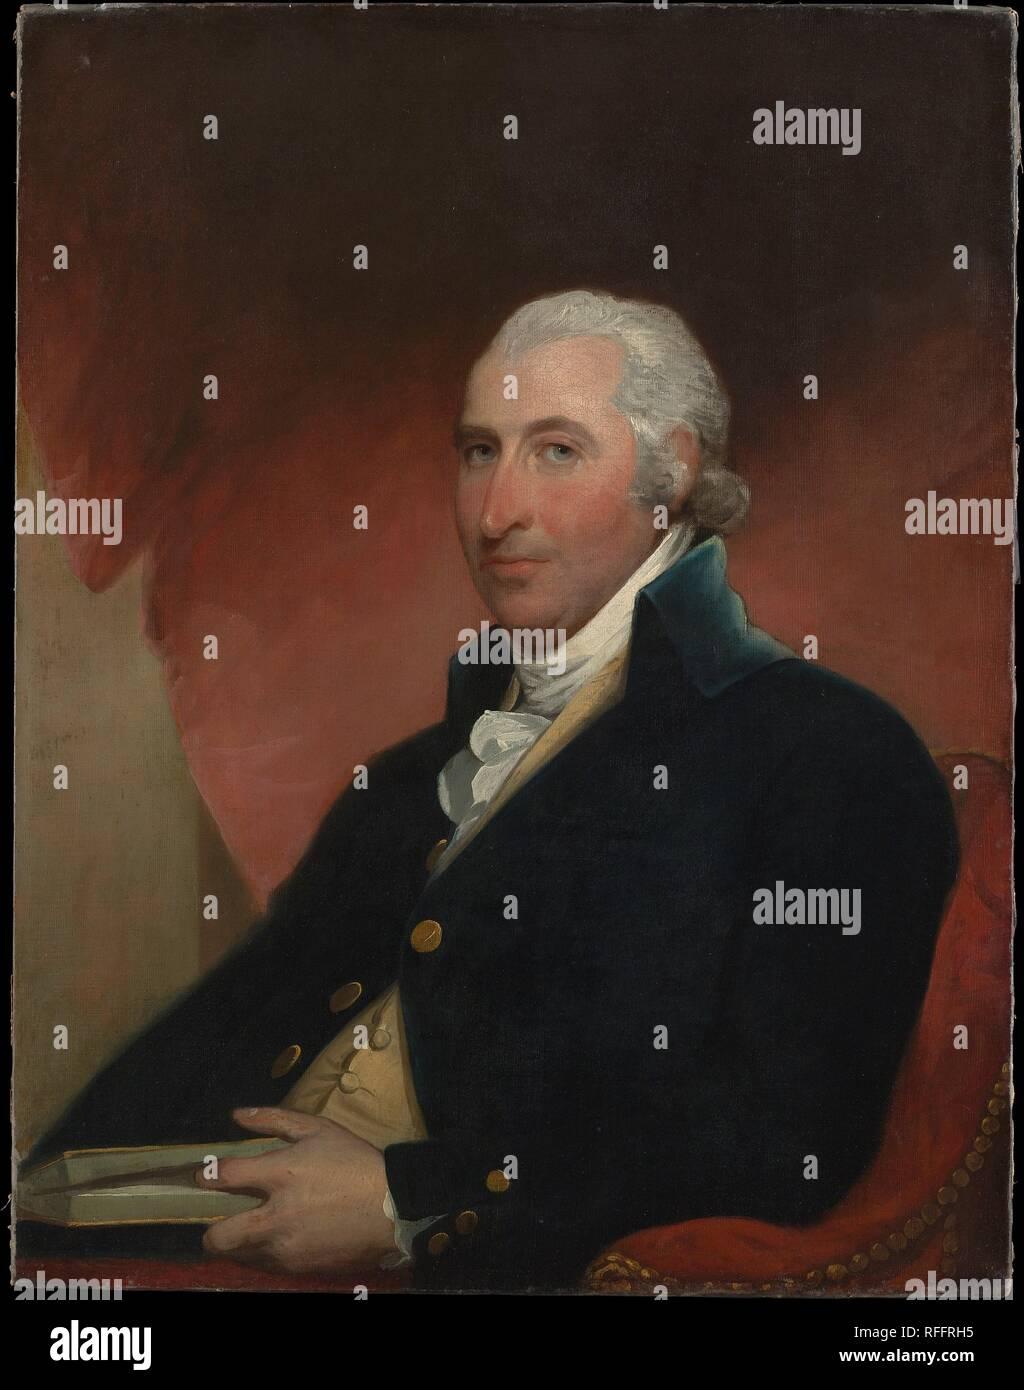 John Shaw. Artista: Gilbert Stuart (American, Nord Kingston, Rhode Island 1755-1828 Boston, Massachusetts). Dimensioni: 36 x 28 in. (91,4 x 71,1 cm). Data: 1793. Museo: Metropolitan Museum of Art di New York, Stati Uniti d'America. Immagini Stock